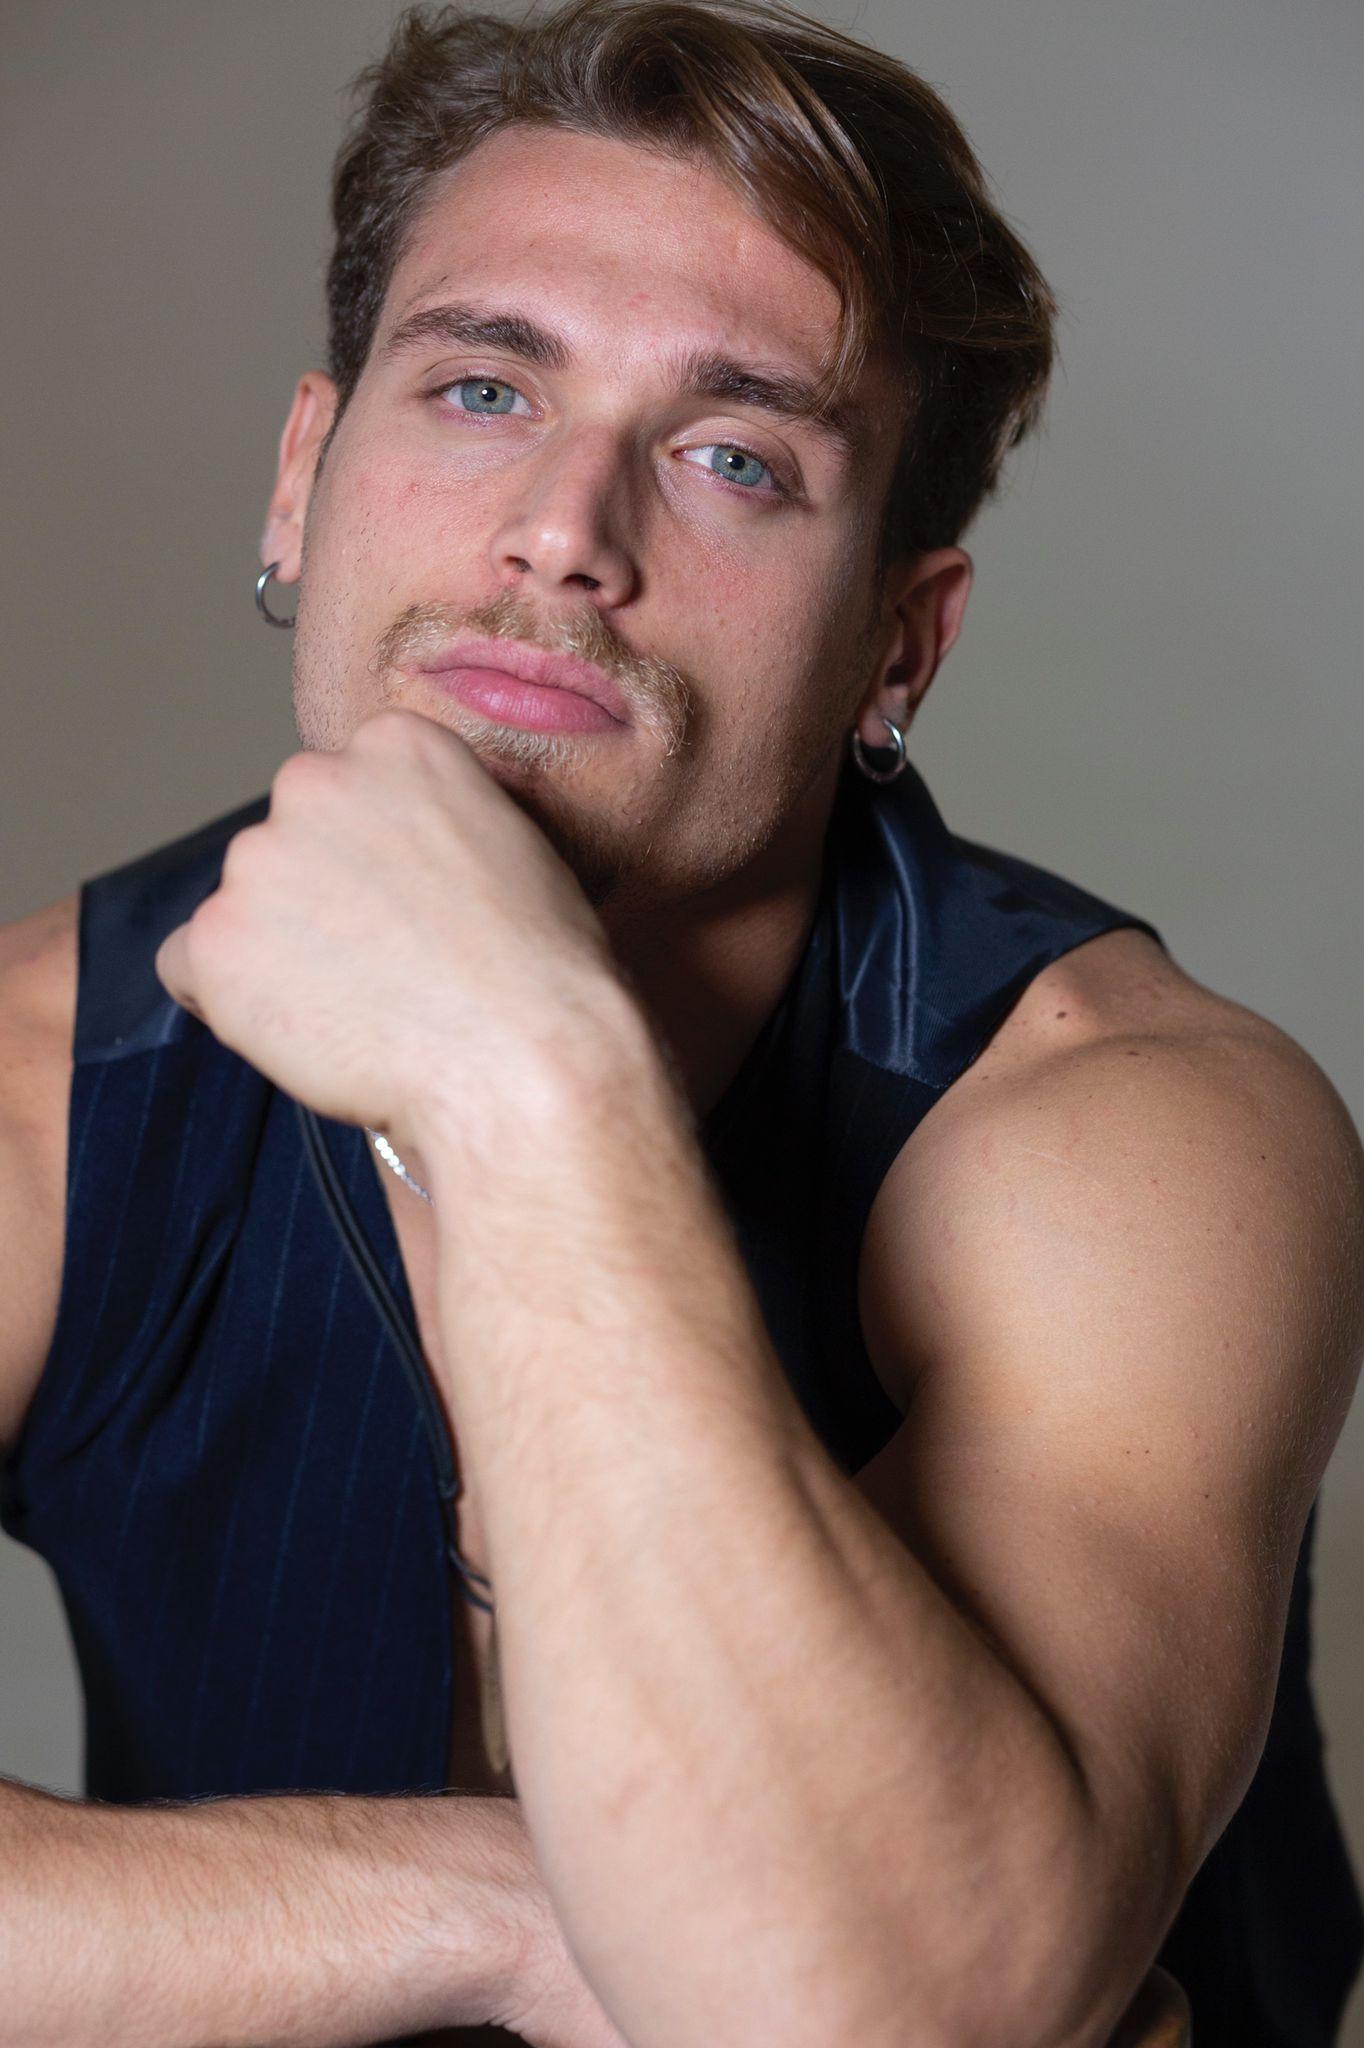 modello biondo occhi azzurri fitness model swimsuit model